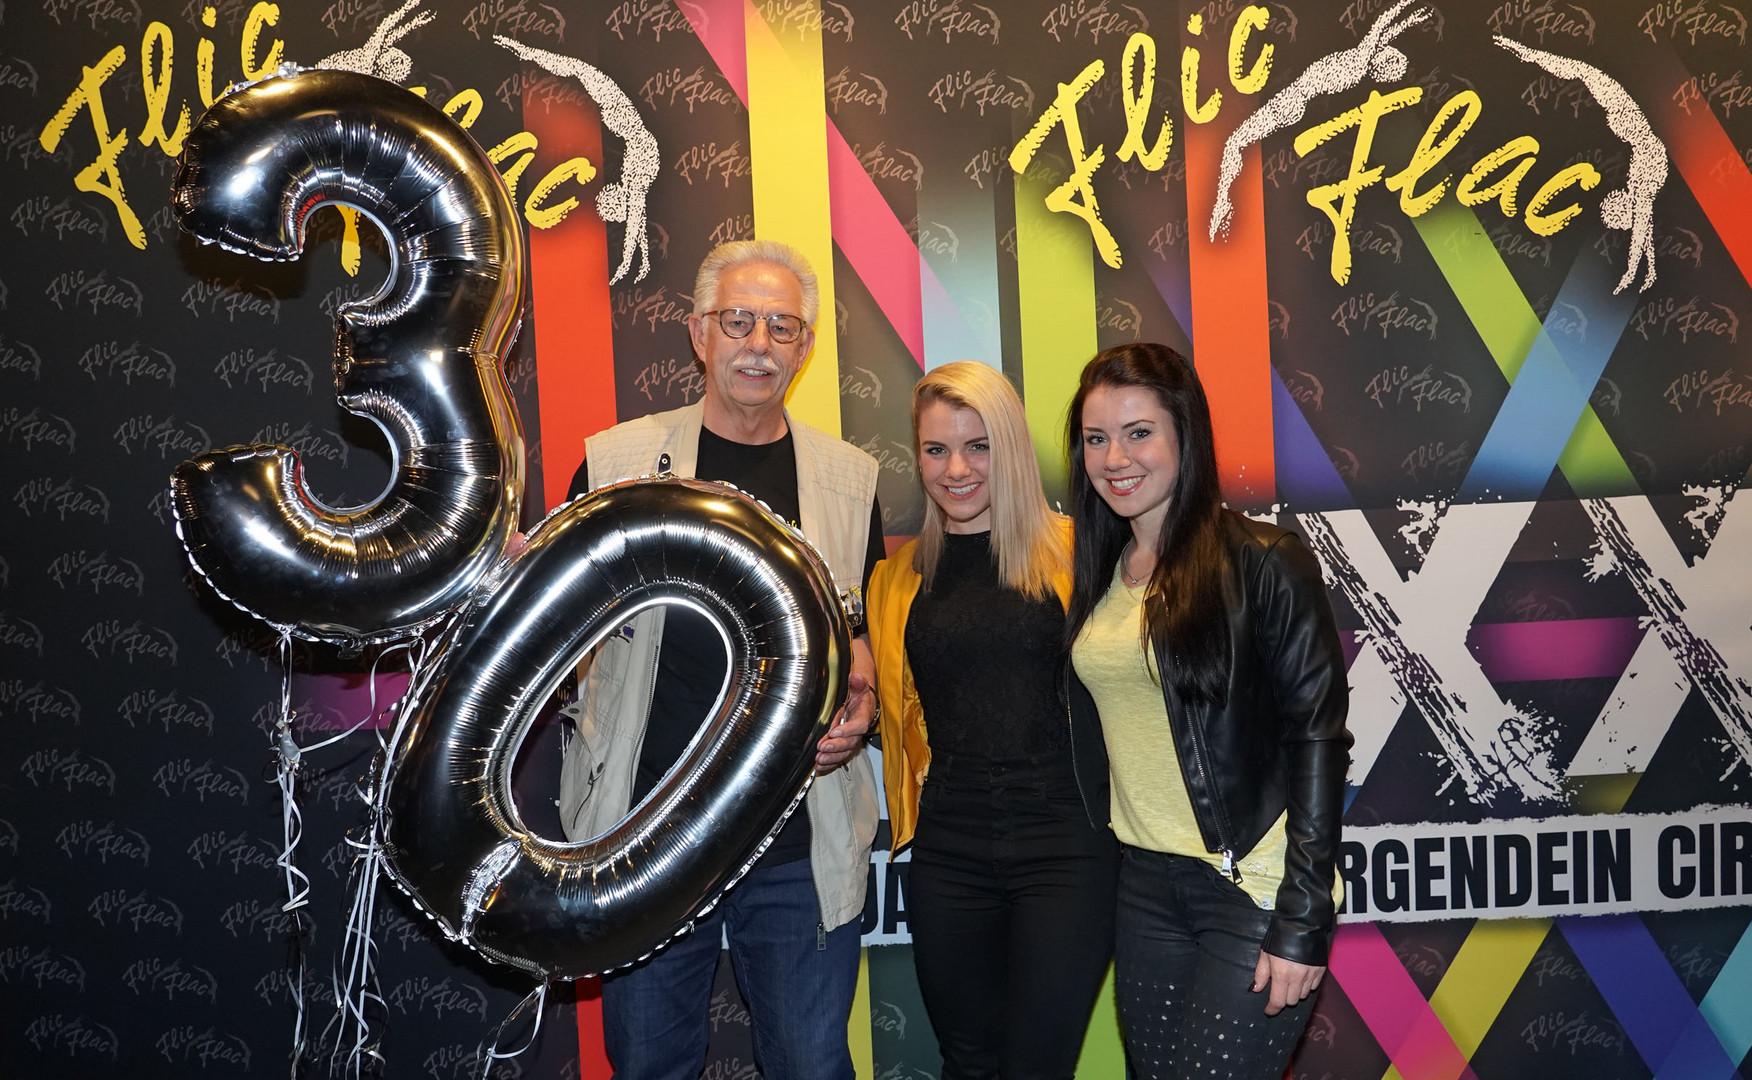 Geburtstag 30 Jahre Flic Flac